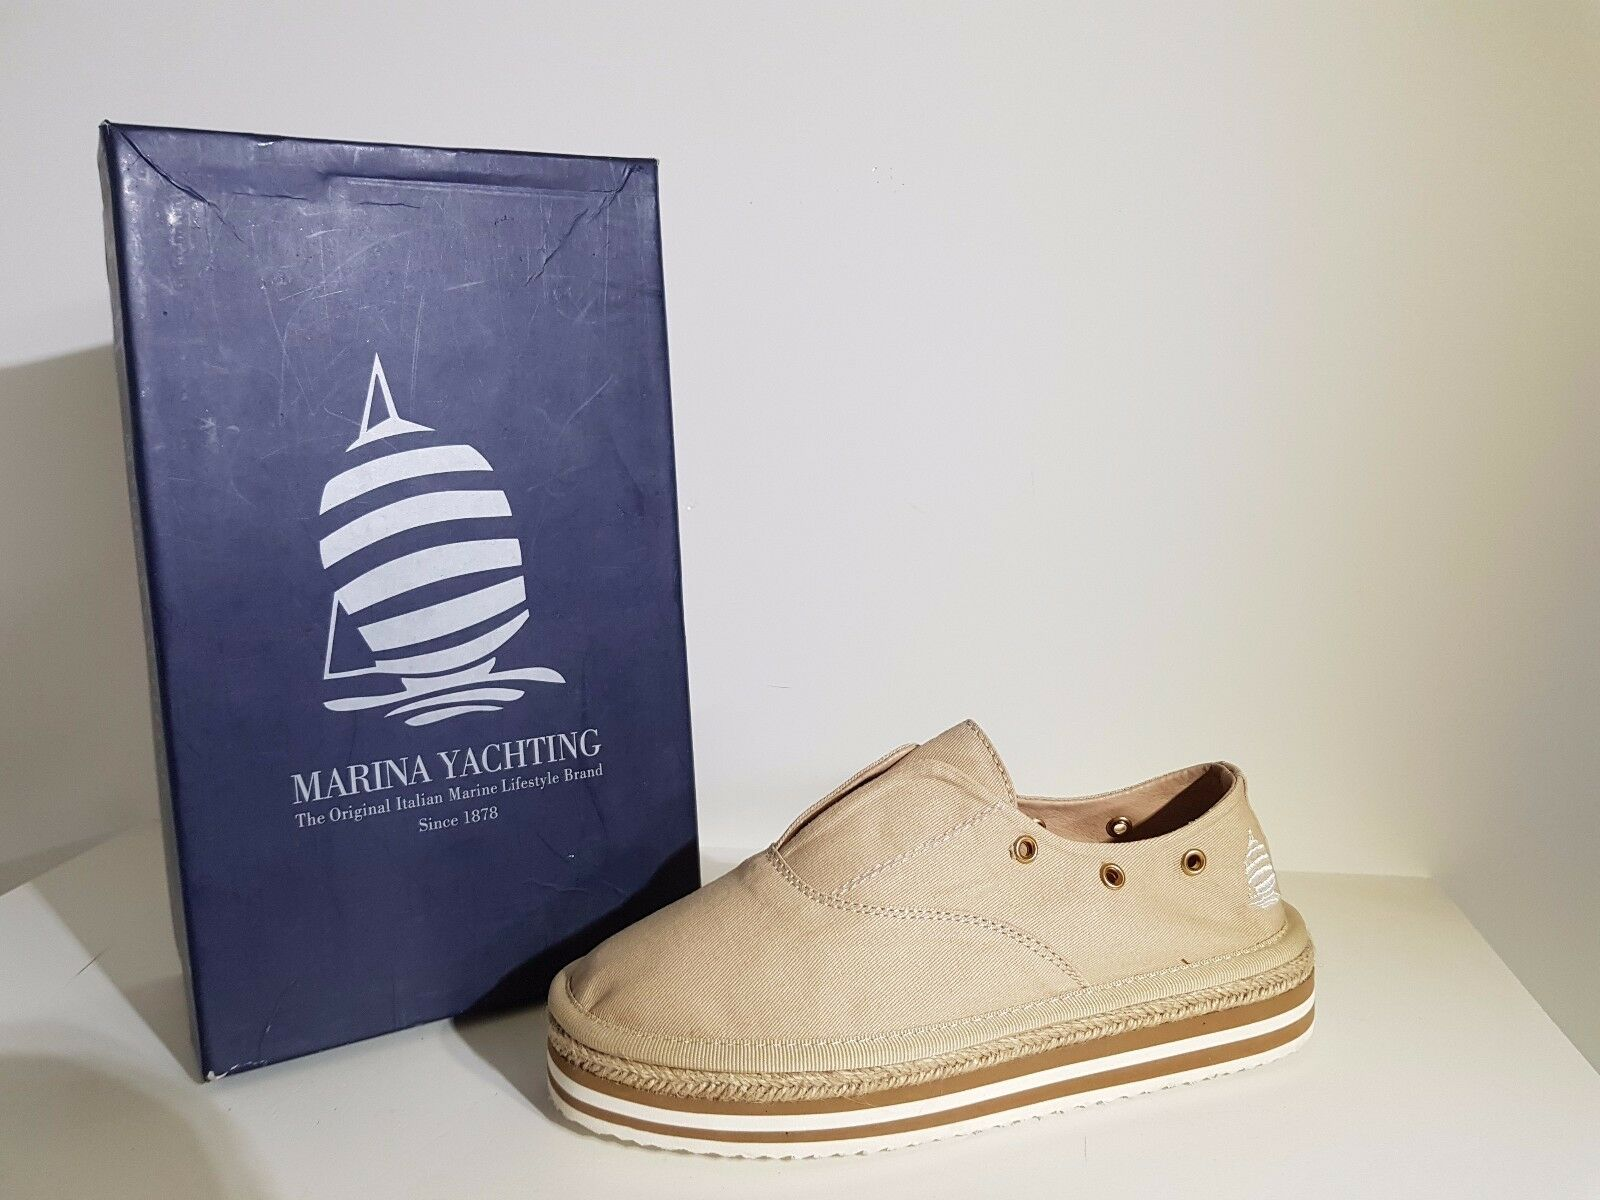 Chaussure Femmes Marina Yachting Remise -20% Art. 161.W661 VERSILISA coul. Beige